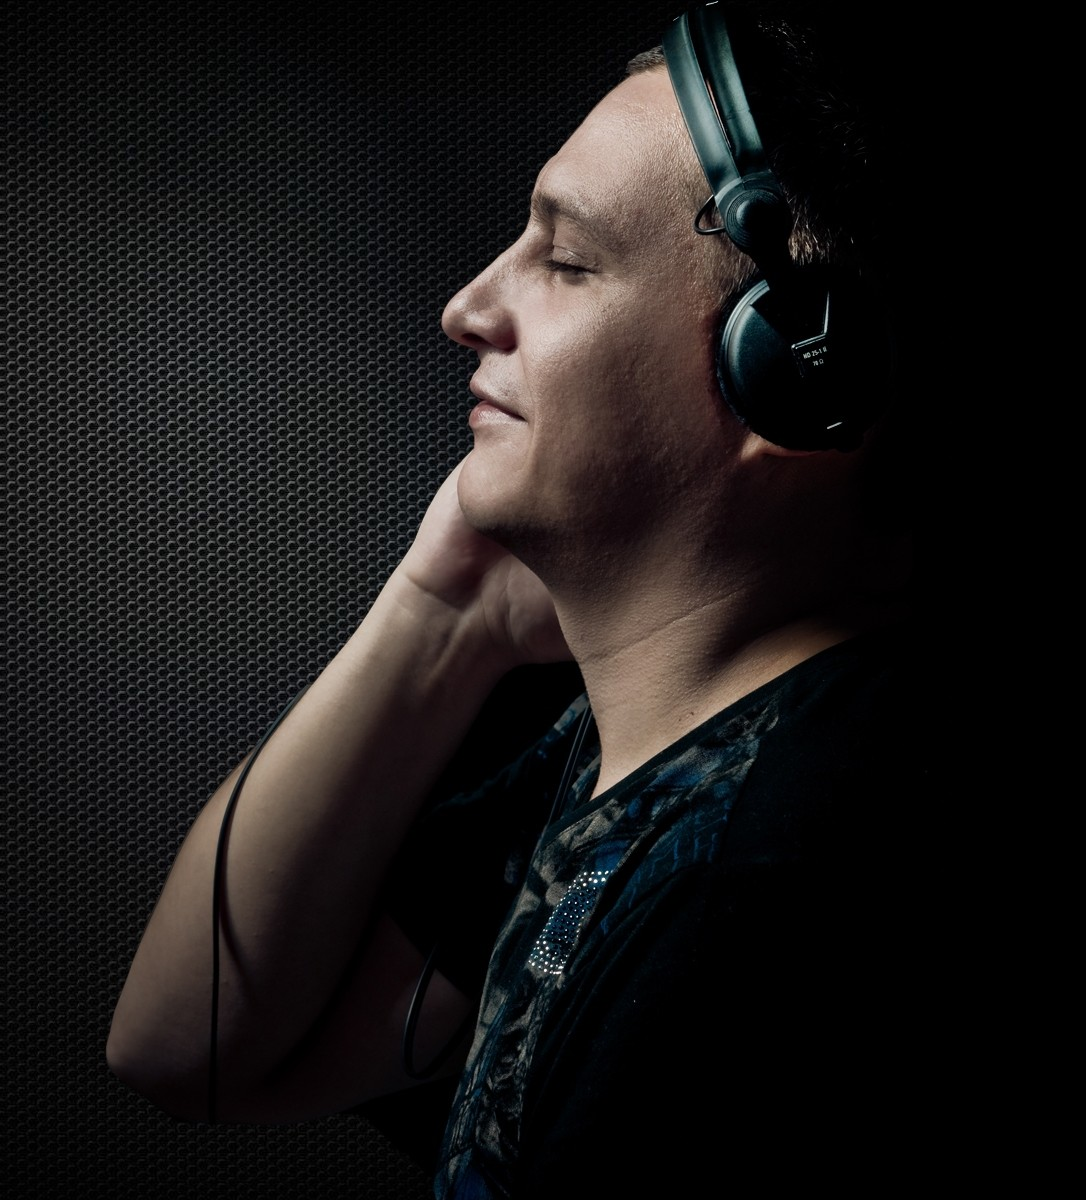 DJ KONSTANTIN OZEROFF